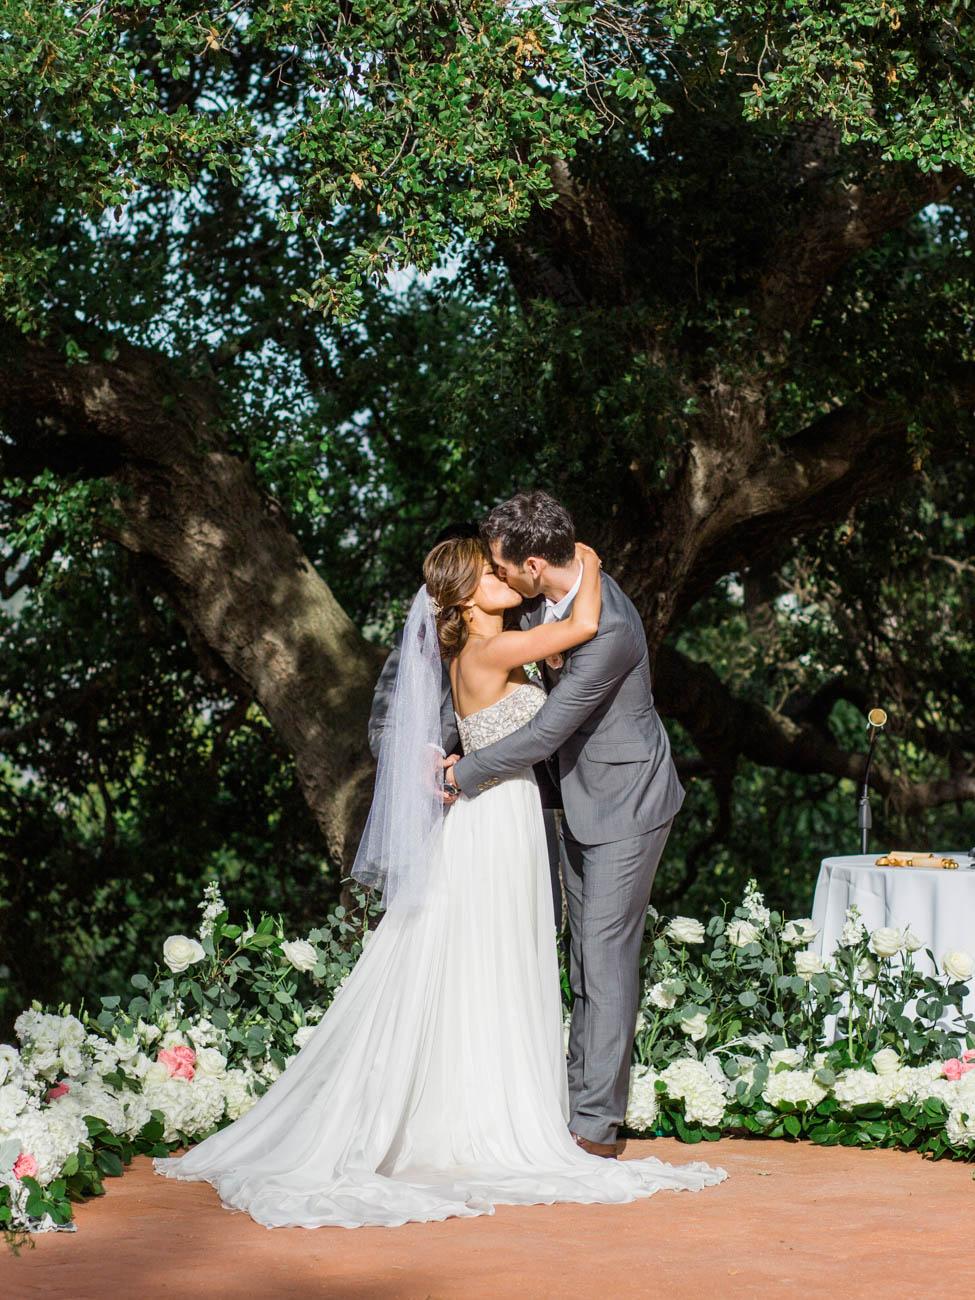 dennisroycoronel_wedding-52.jpg